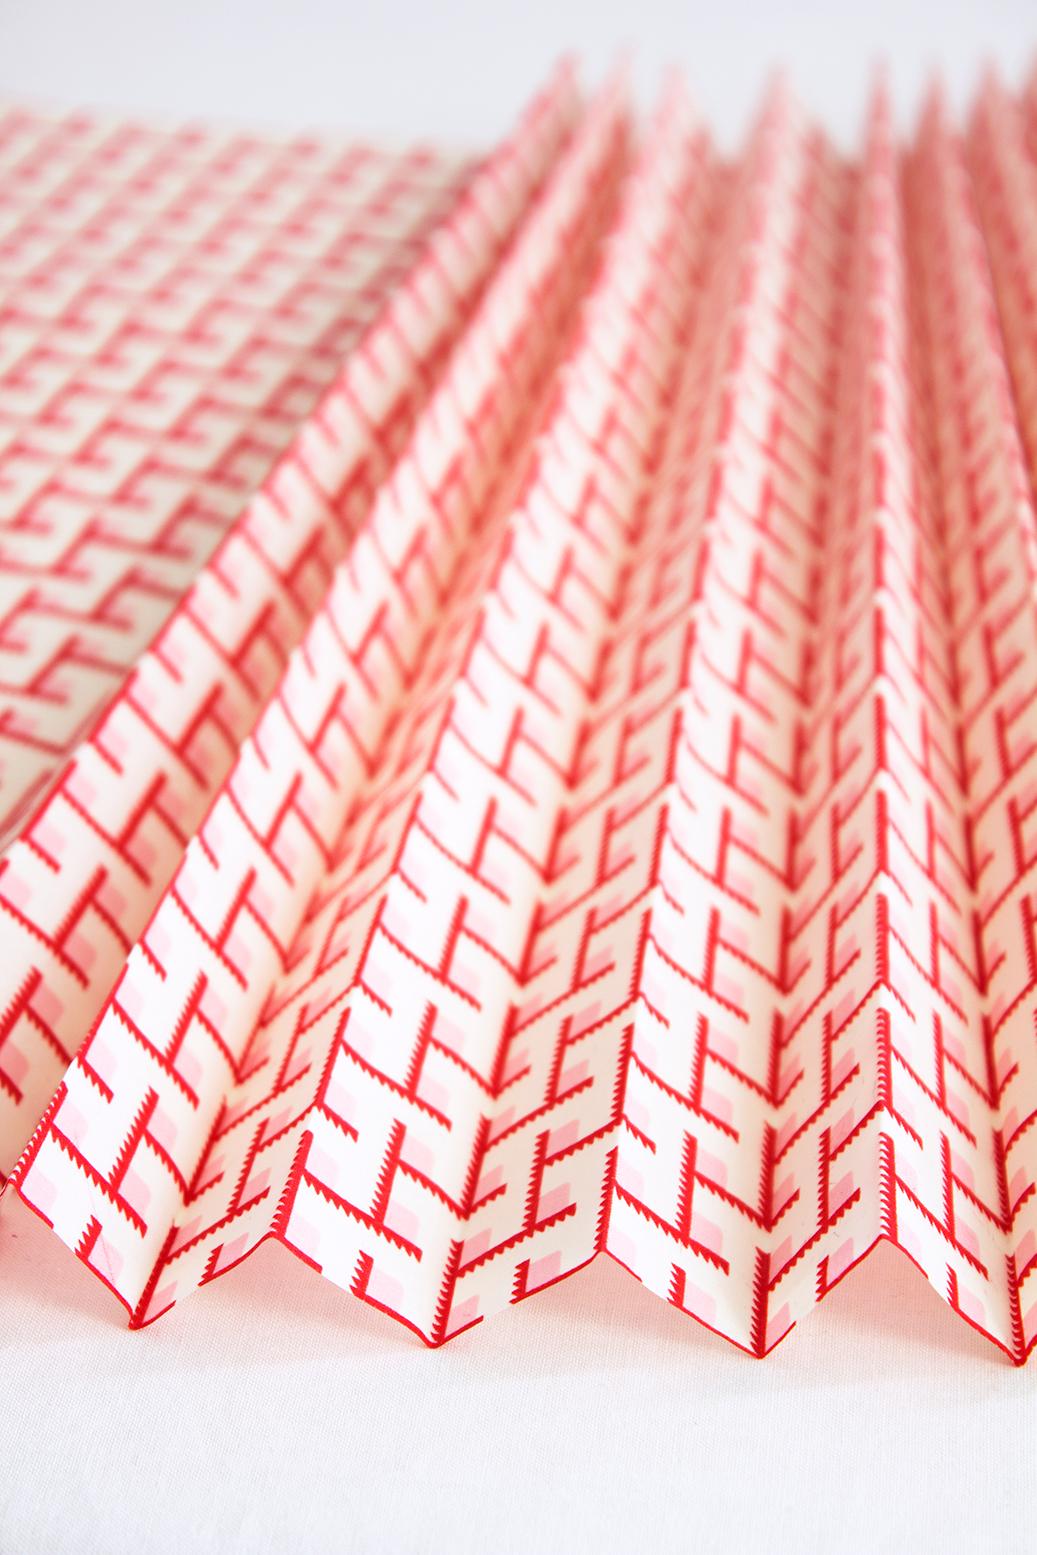 Corrie_Hogg_DIY_fabric_lamp_3.5